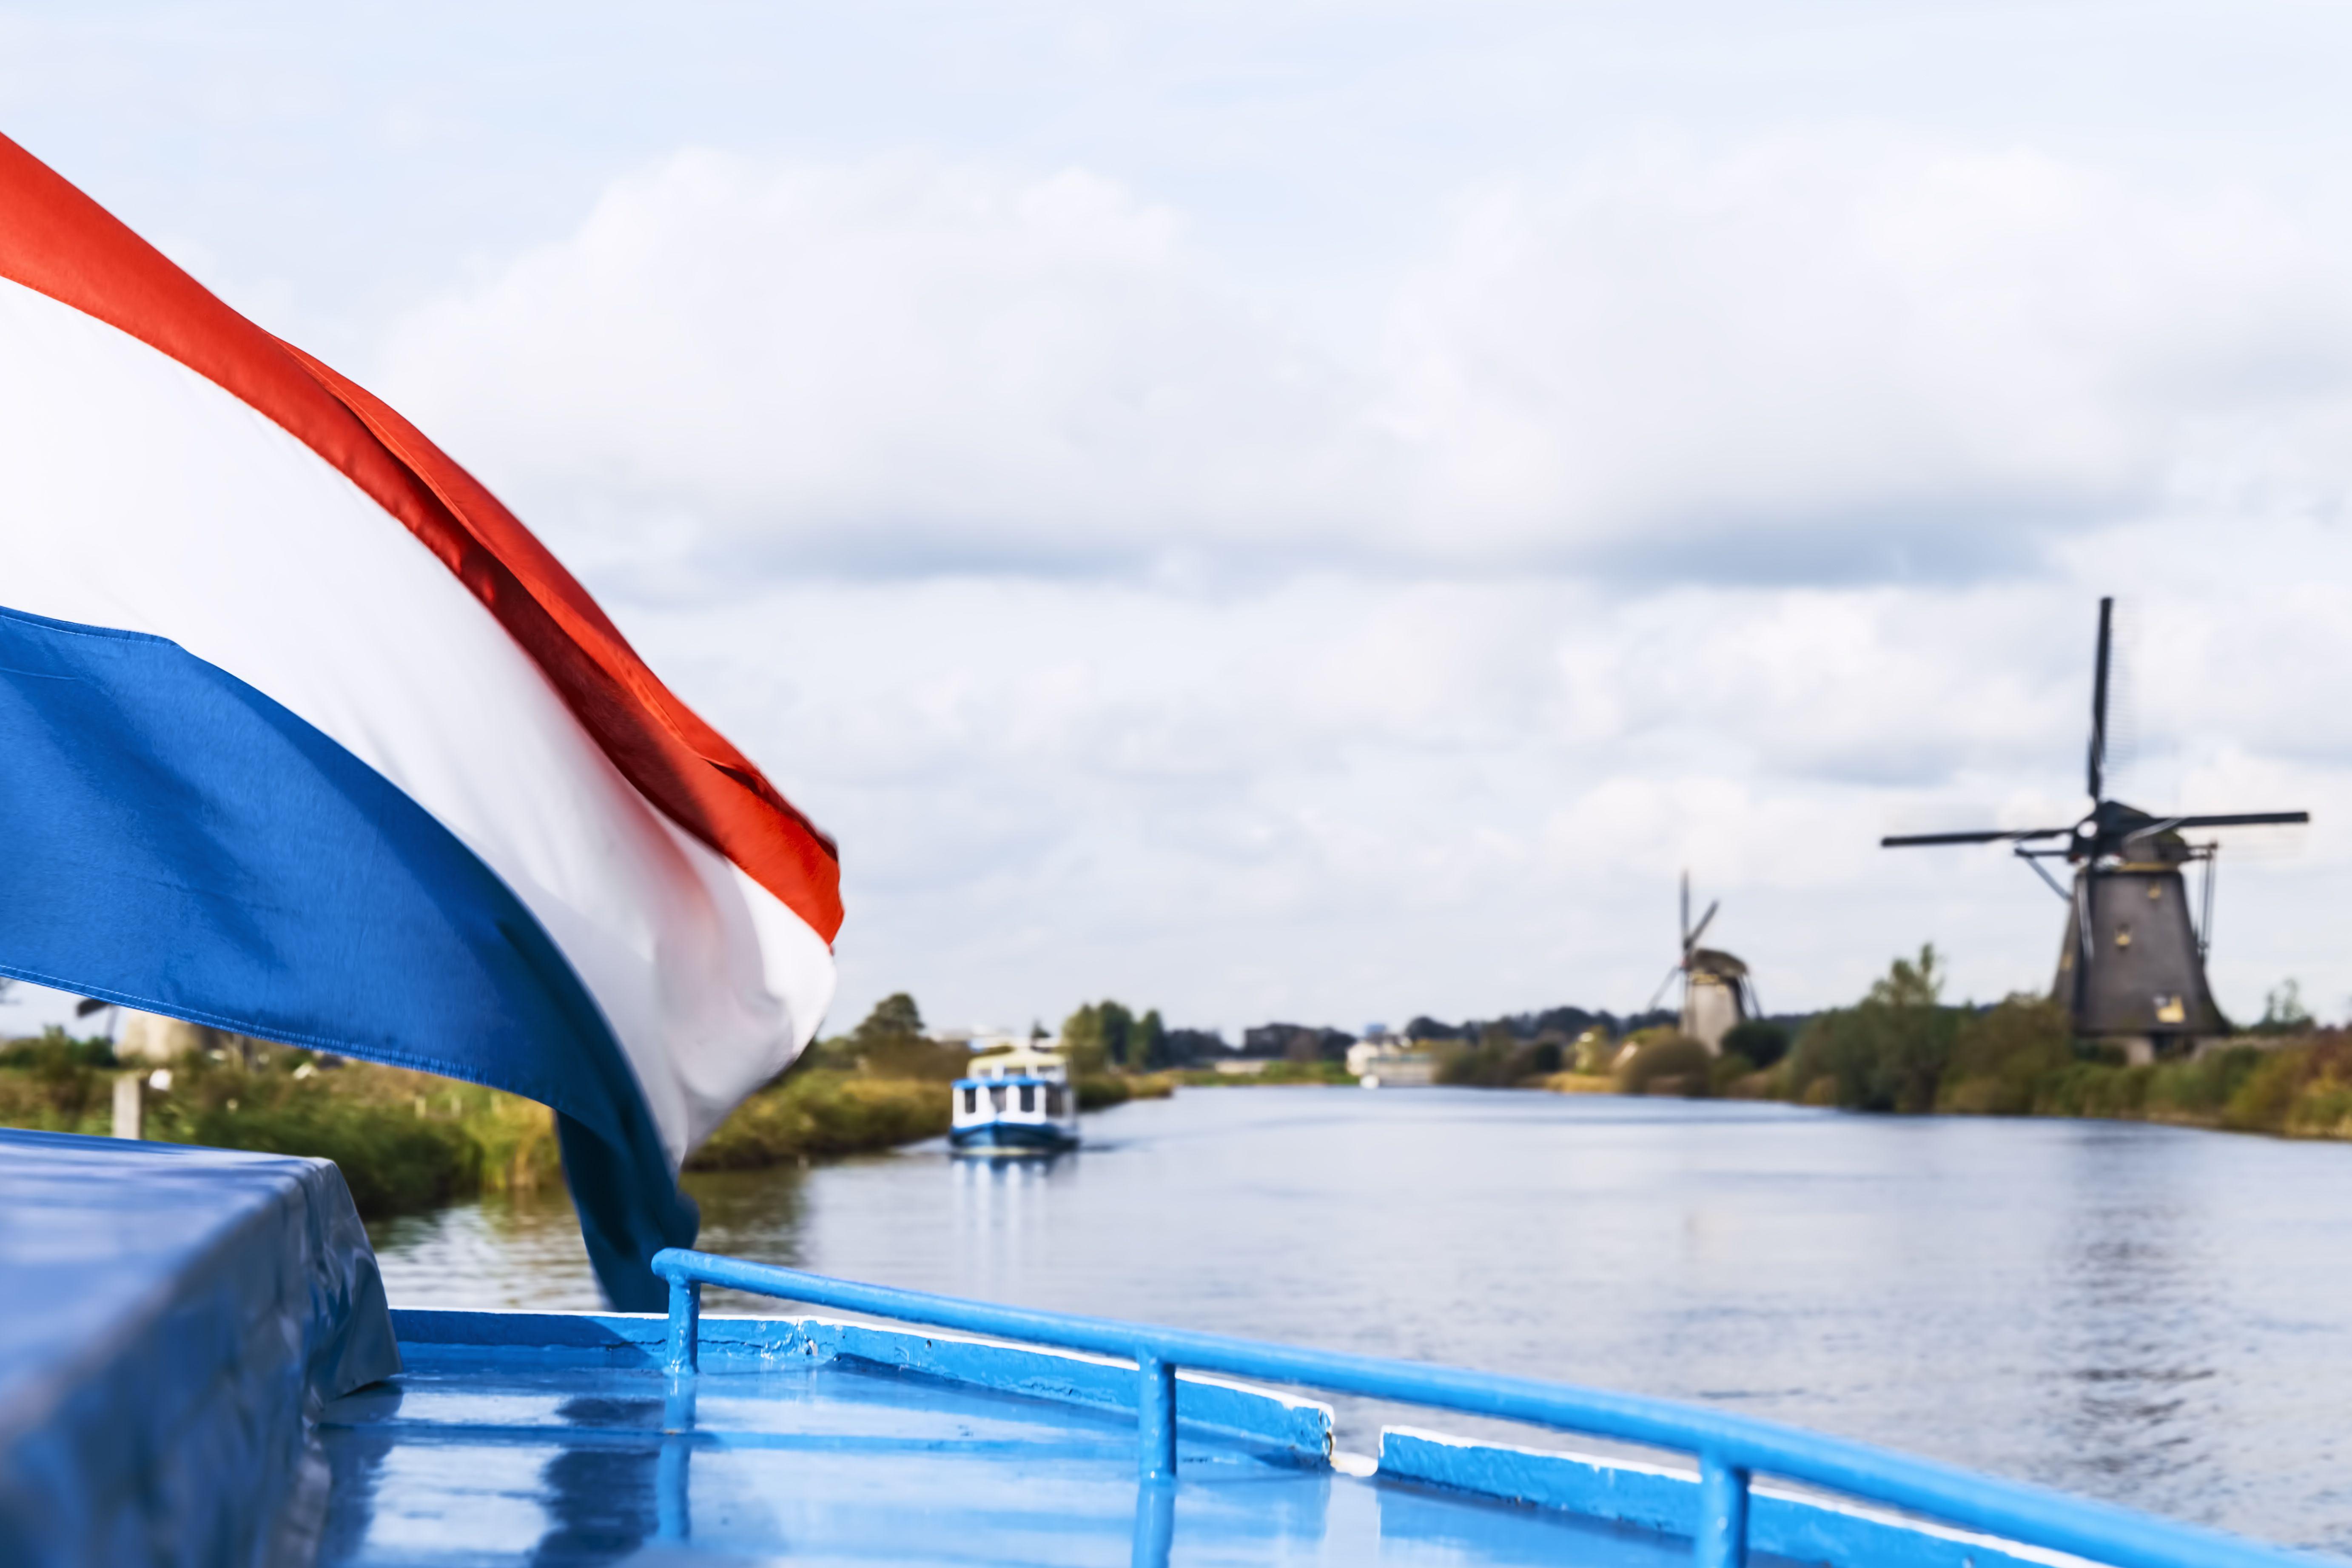 Dutch Flag Waving In The Wind Against Windmills, Kinderdijk, Netherlands